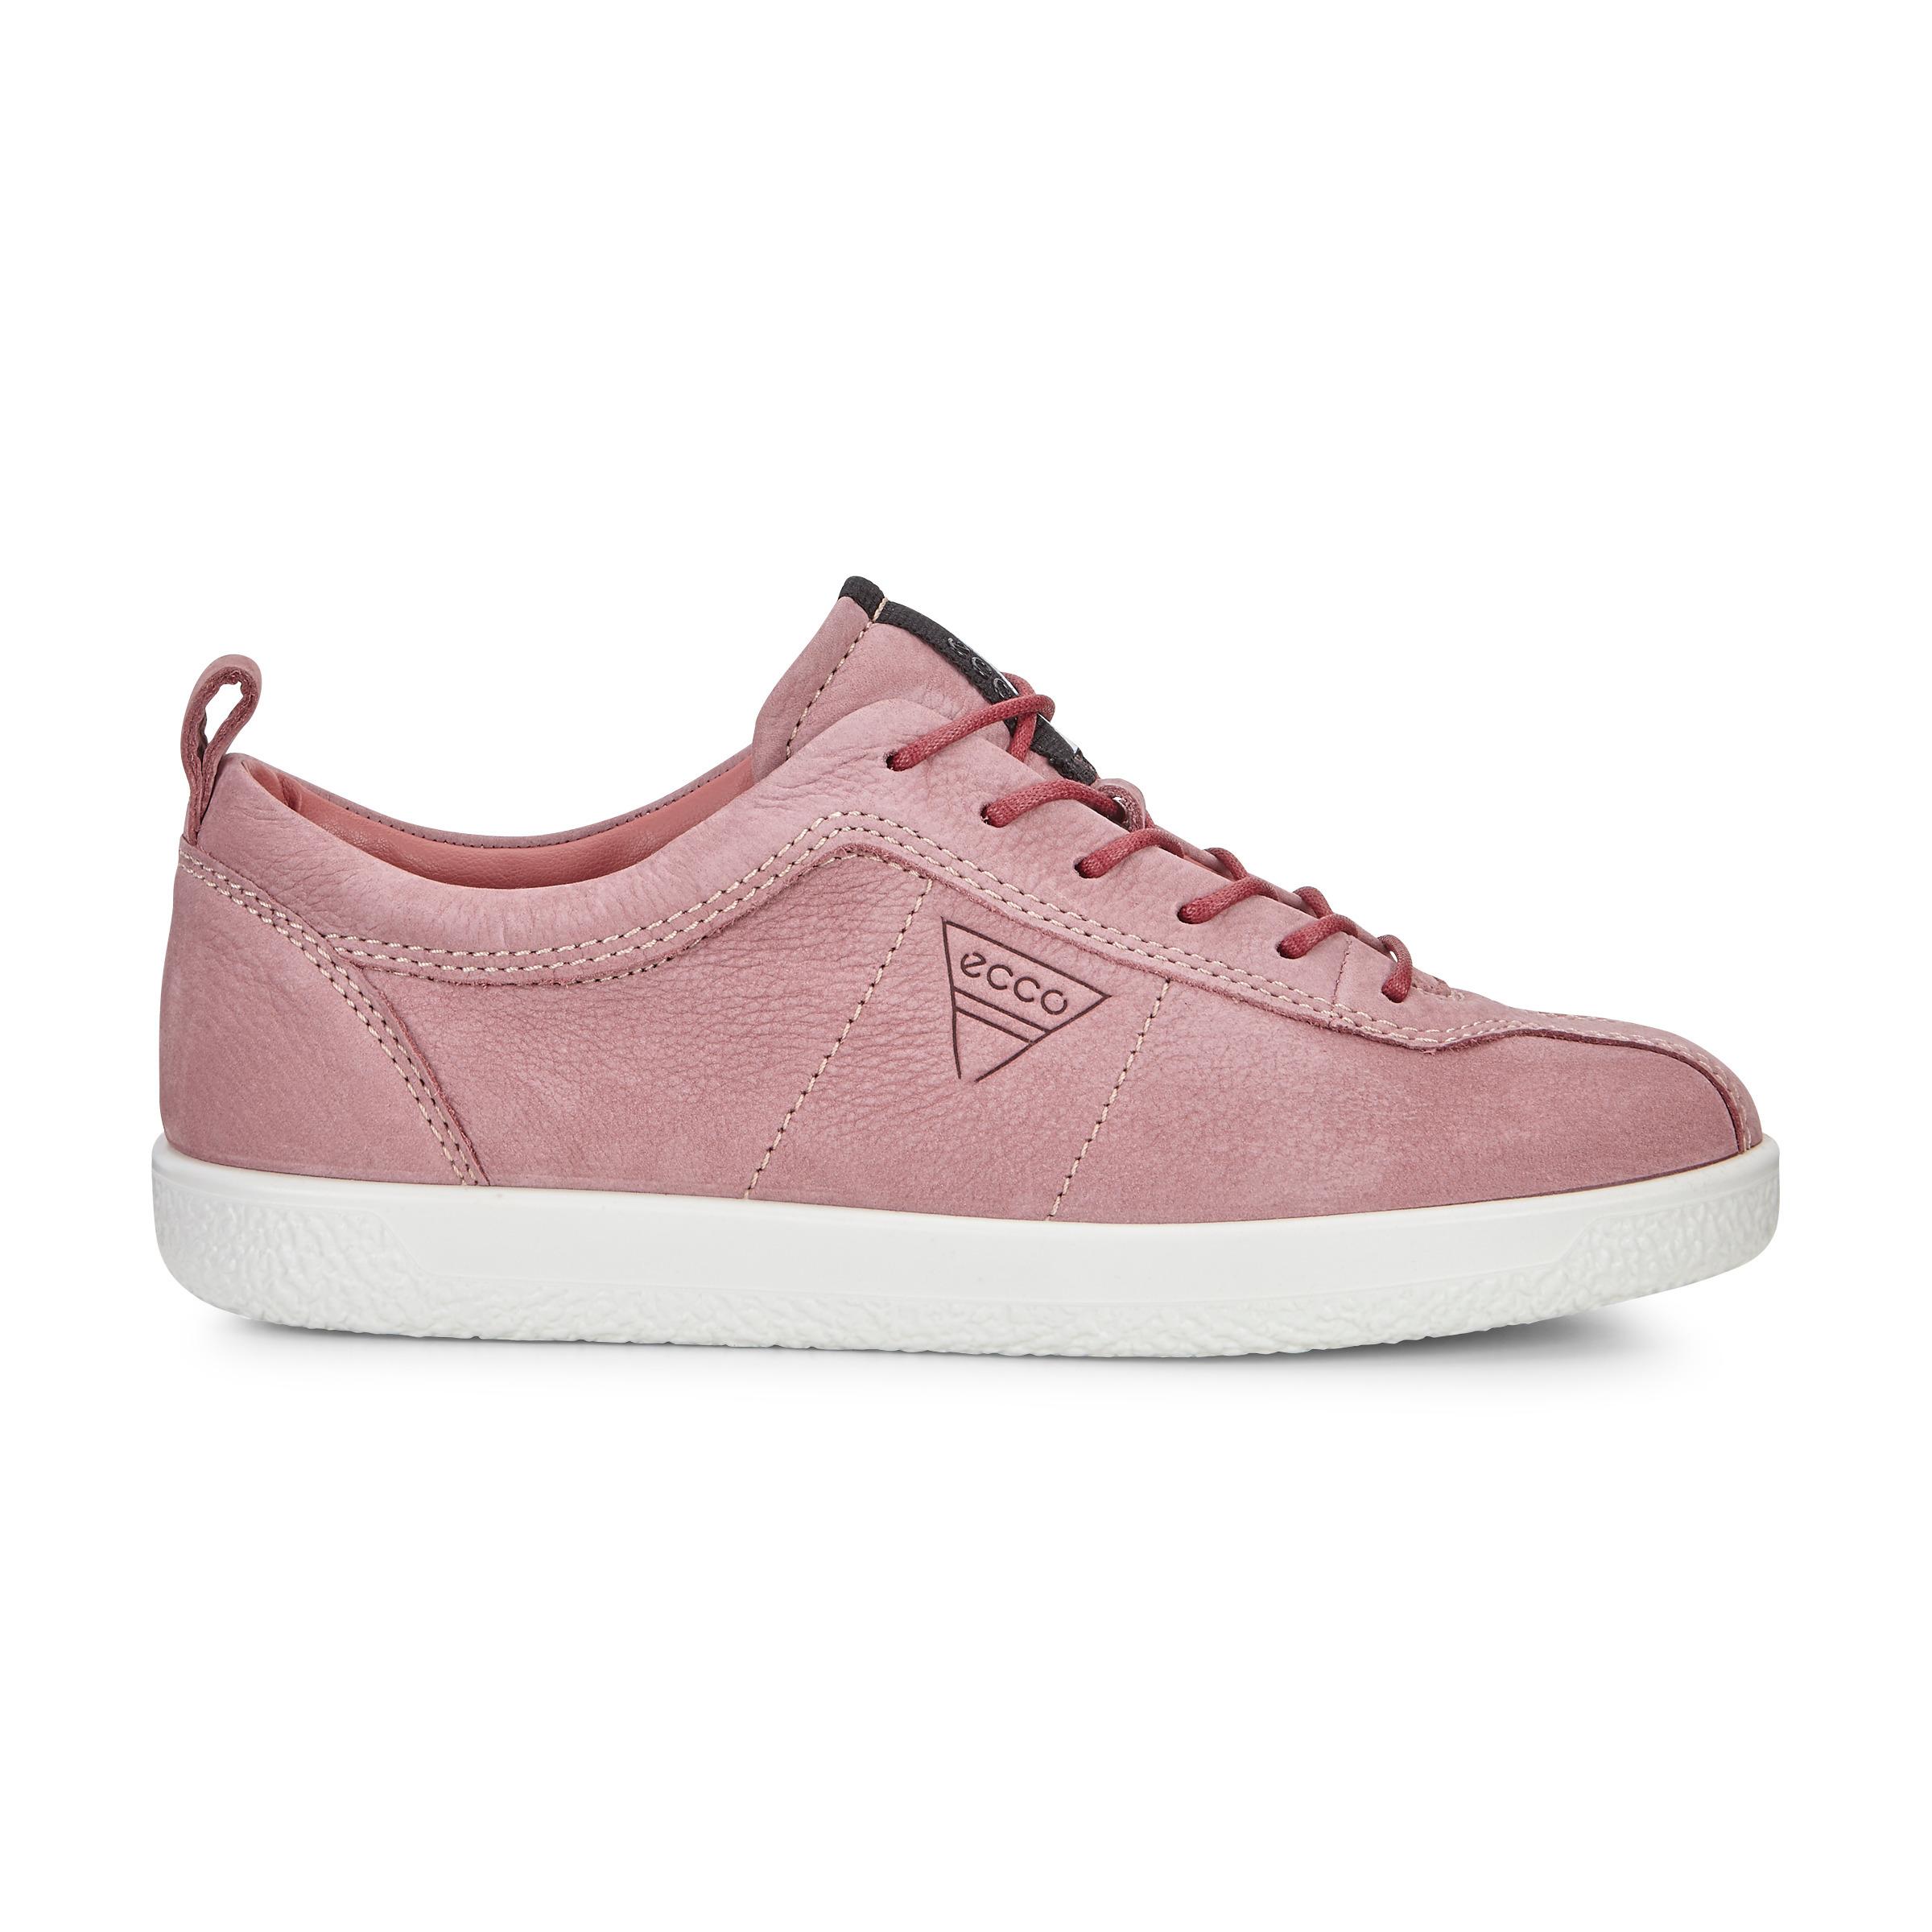 ECCO Damen Soft 1 400503 Sneaker